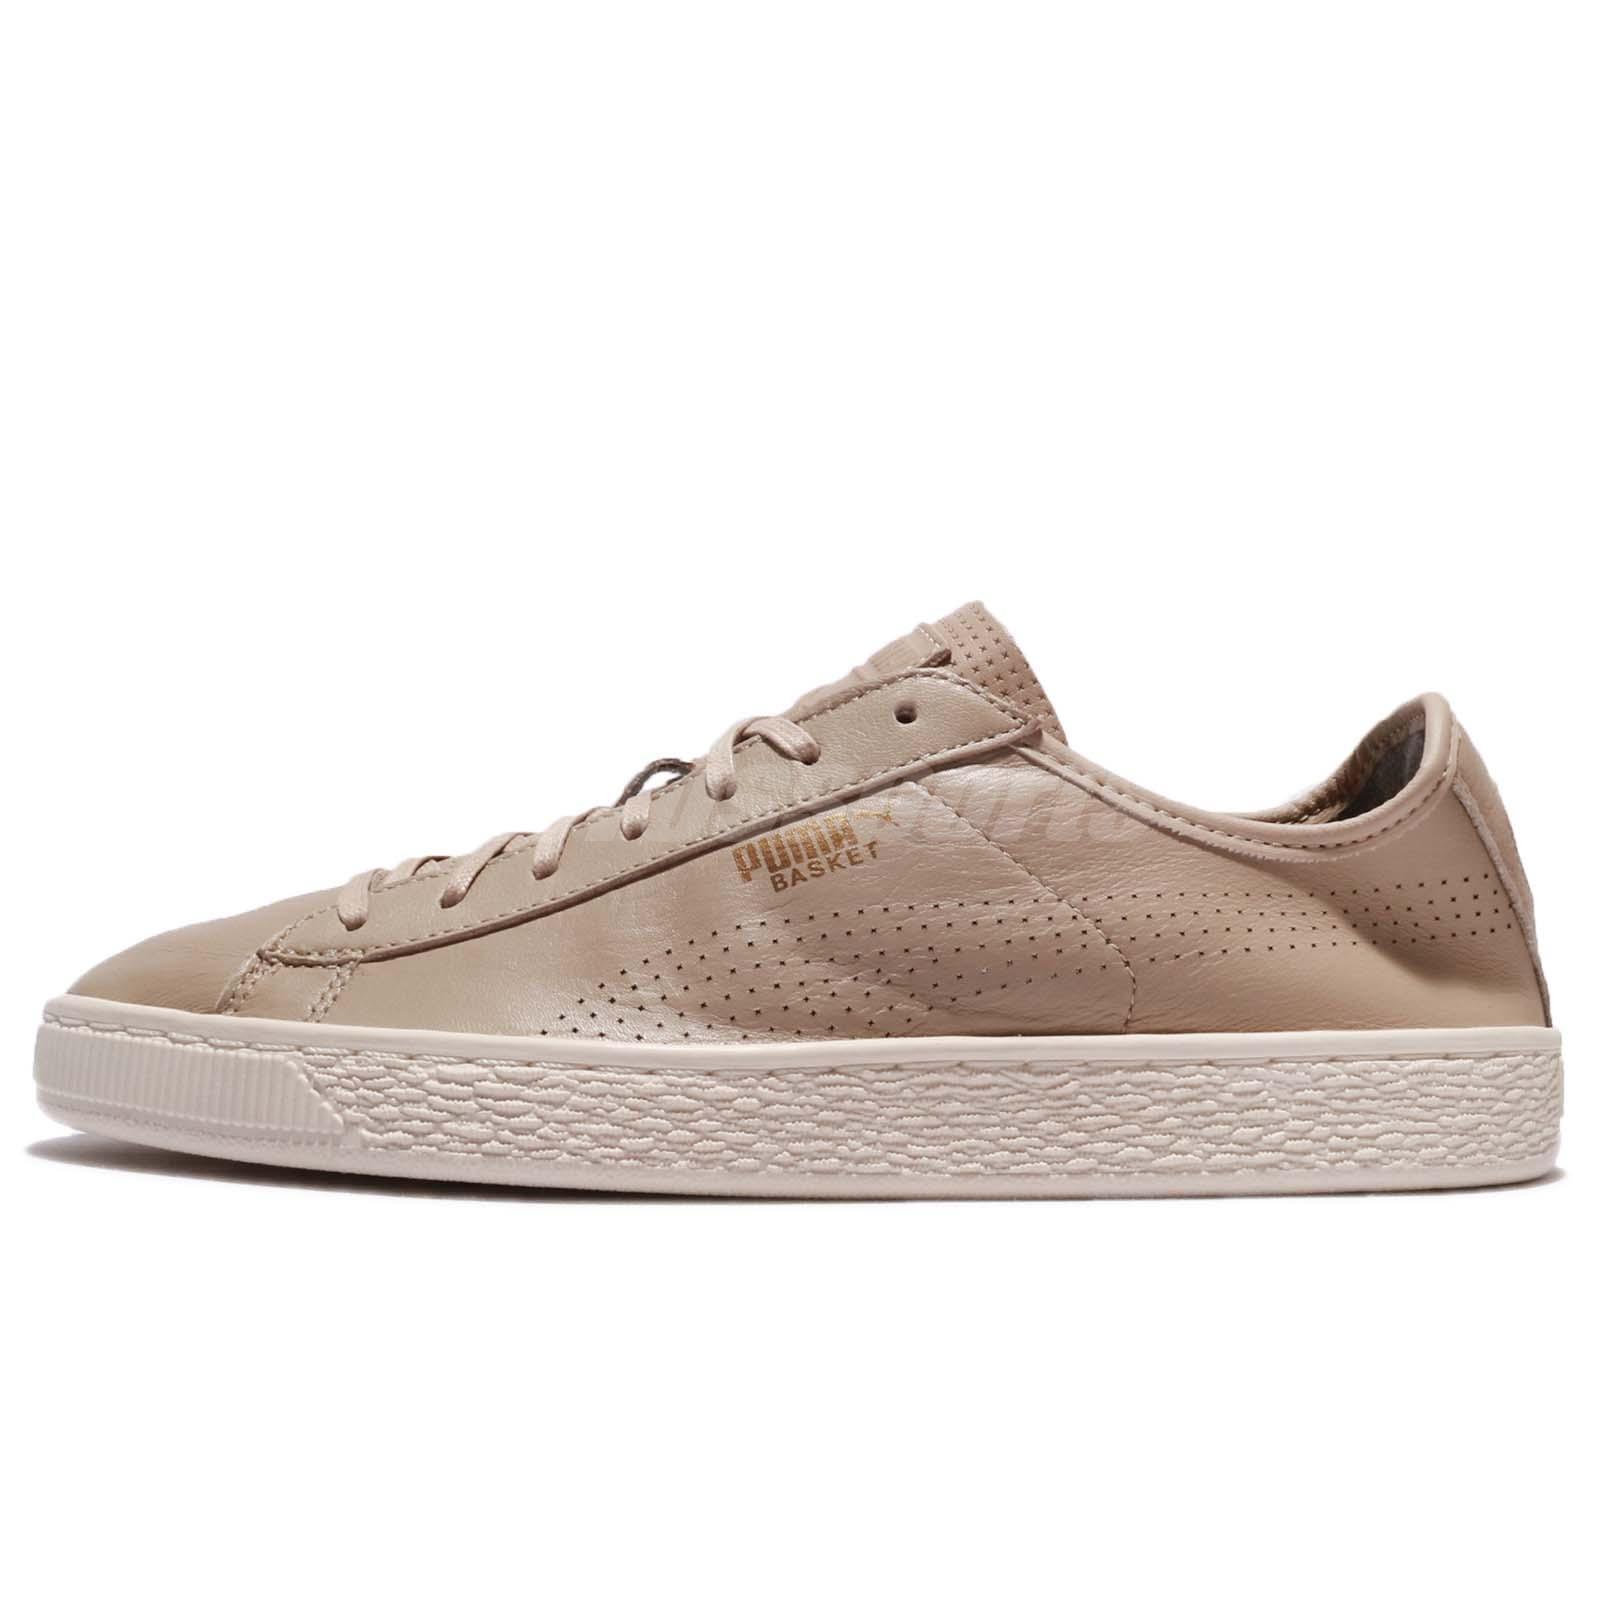 5f336db46055 Puma Basket Classic Soft Leather Safari Light Brown Men Shoes Sneakers  363824-05